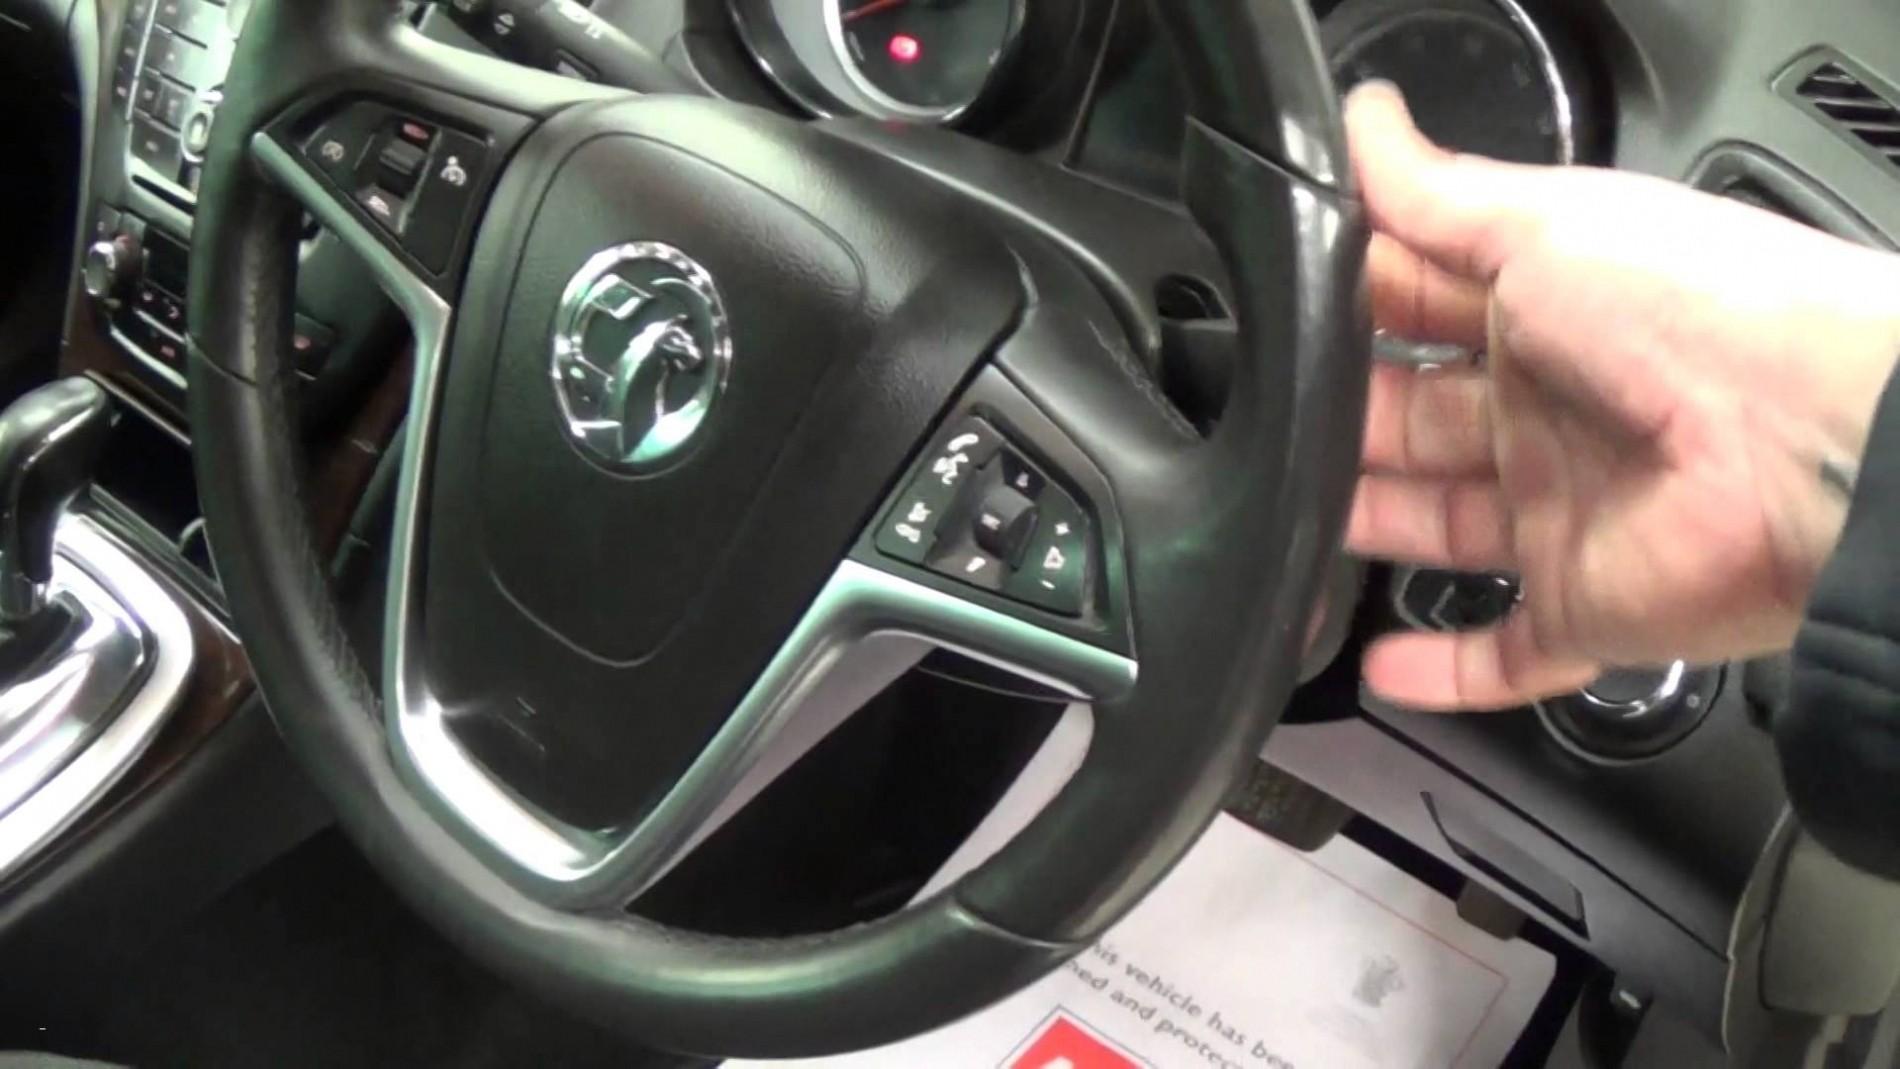 Car Steering Diagram Hot News 5 Door Electric Car Elegant toyota fortuner 3 0d 4d 4—4 Of Car Steering Diagram Wiring Diagram Car Stereo Valid 2003 Mitsubishi Eclipse Radio Wiring